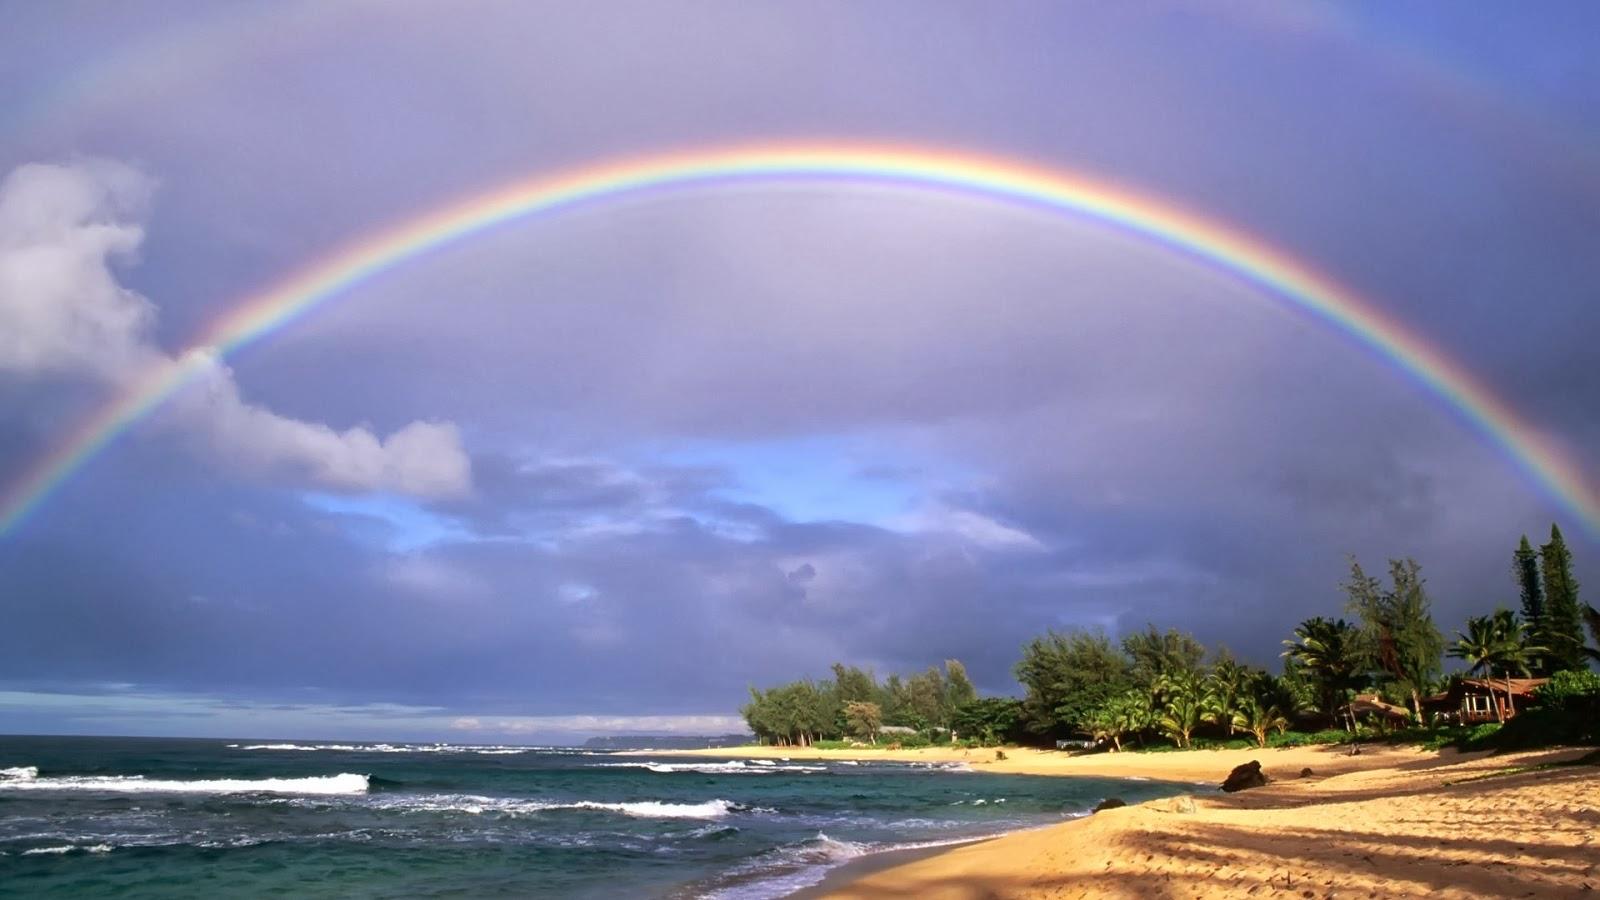 Natural Rainbow 4u Hd Wallpaper All 4u Wallpaper